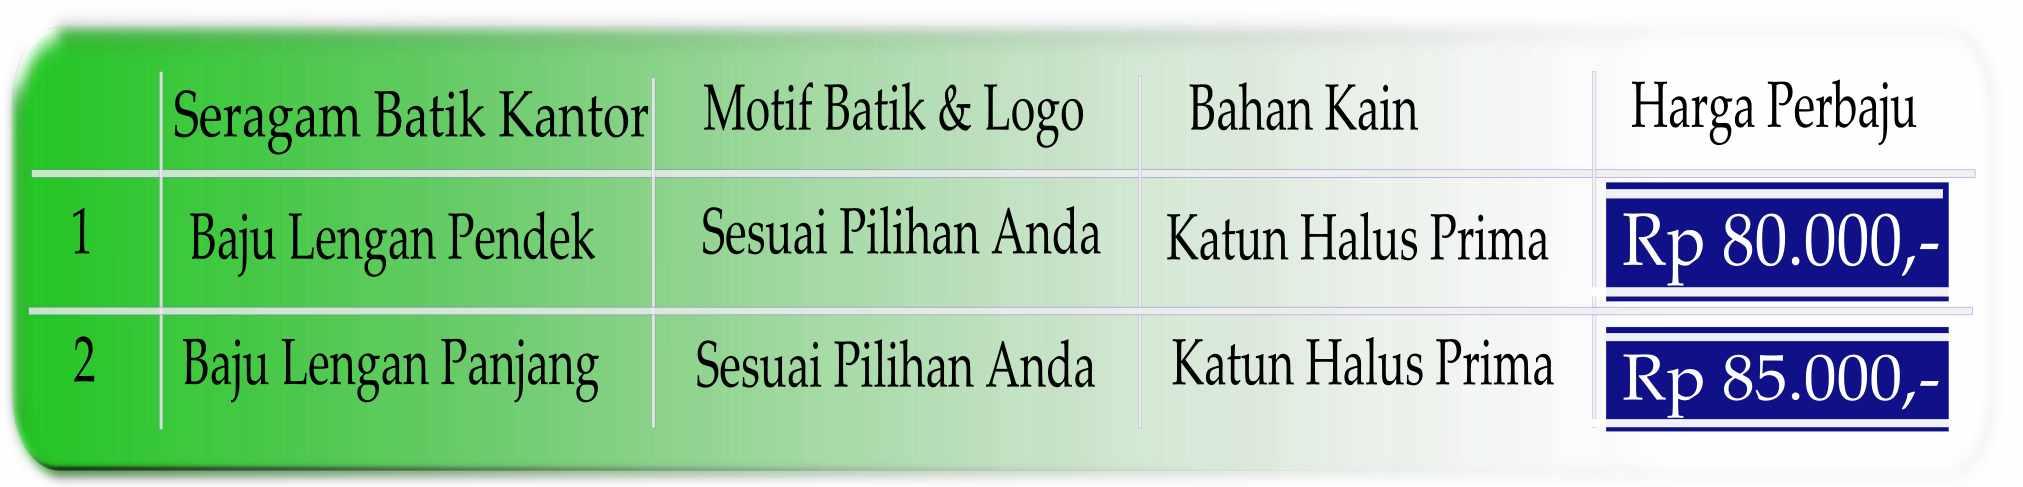 Seragam batik kantor Kalimantan Tengah modern siap pakai katun prima